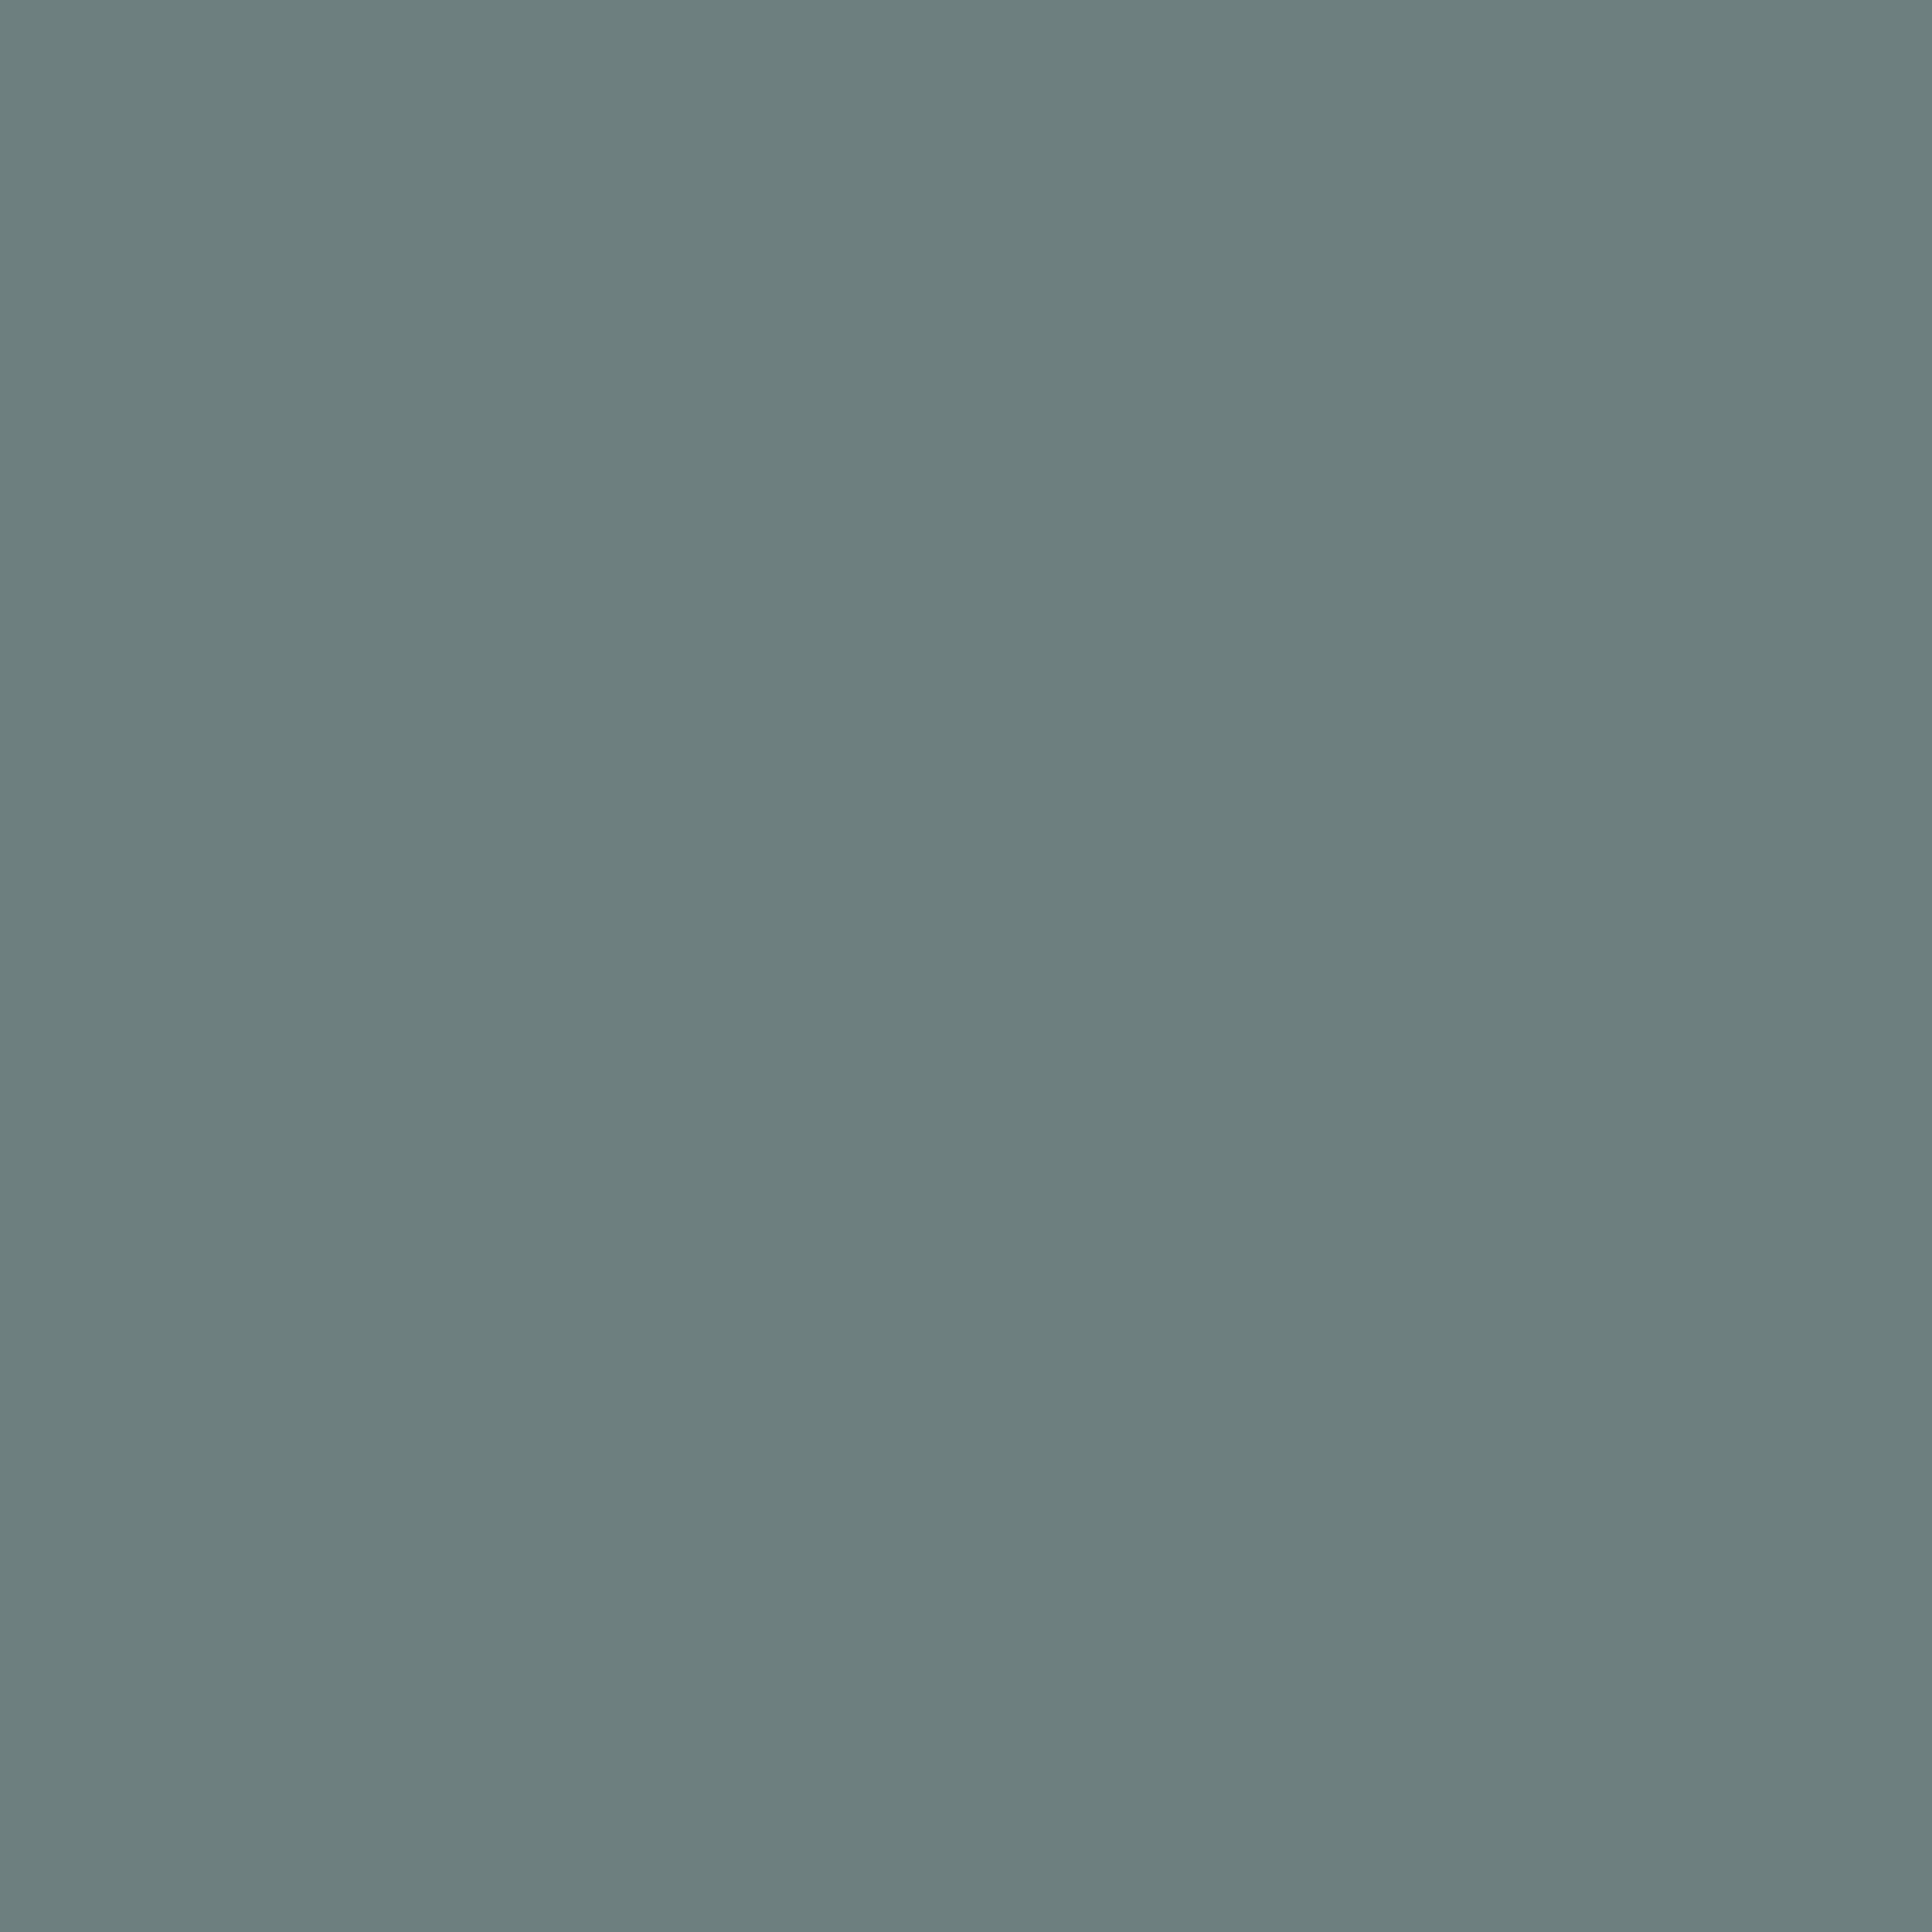 3600x3600 AuroMetalSaurus Solid Color Background